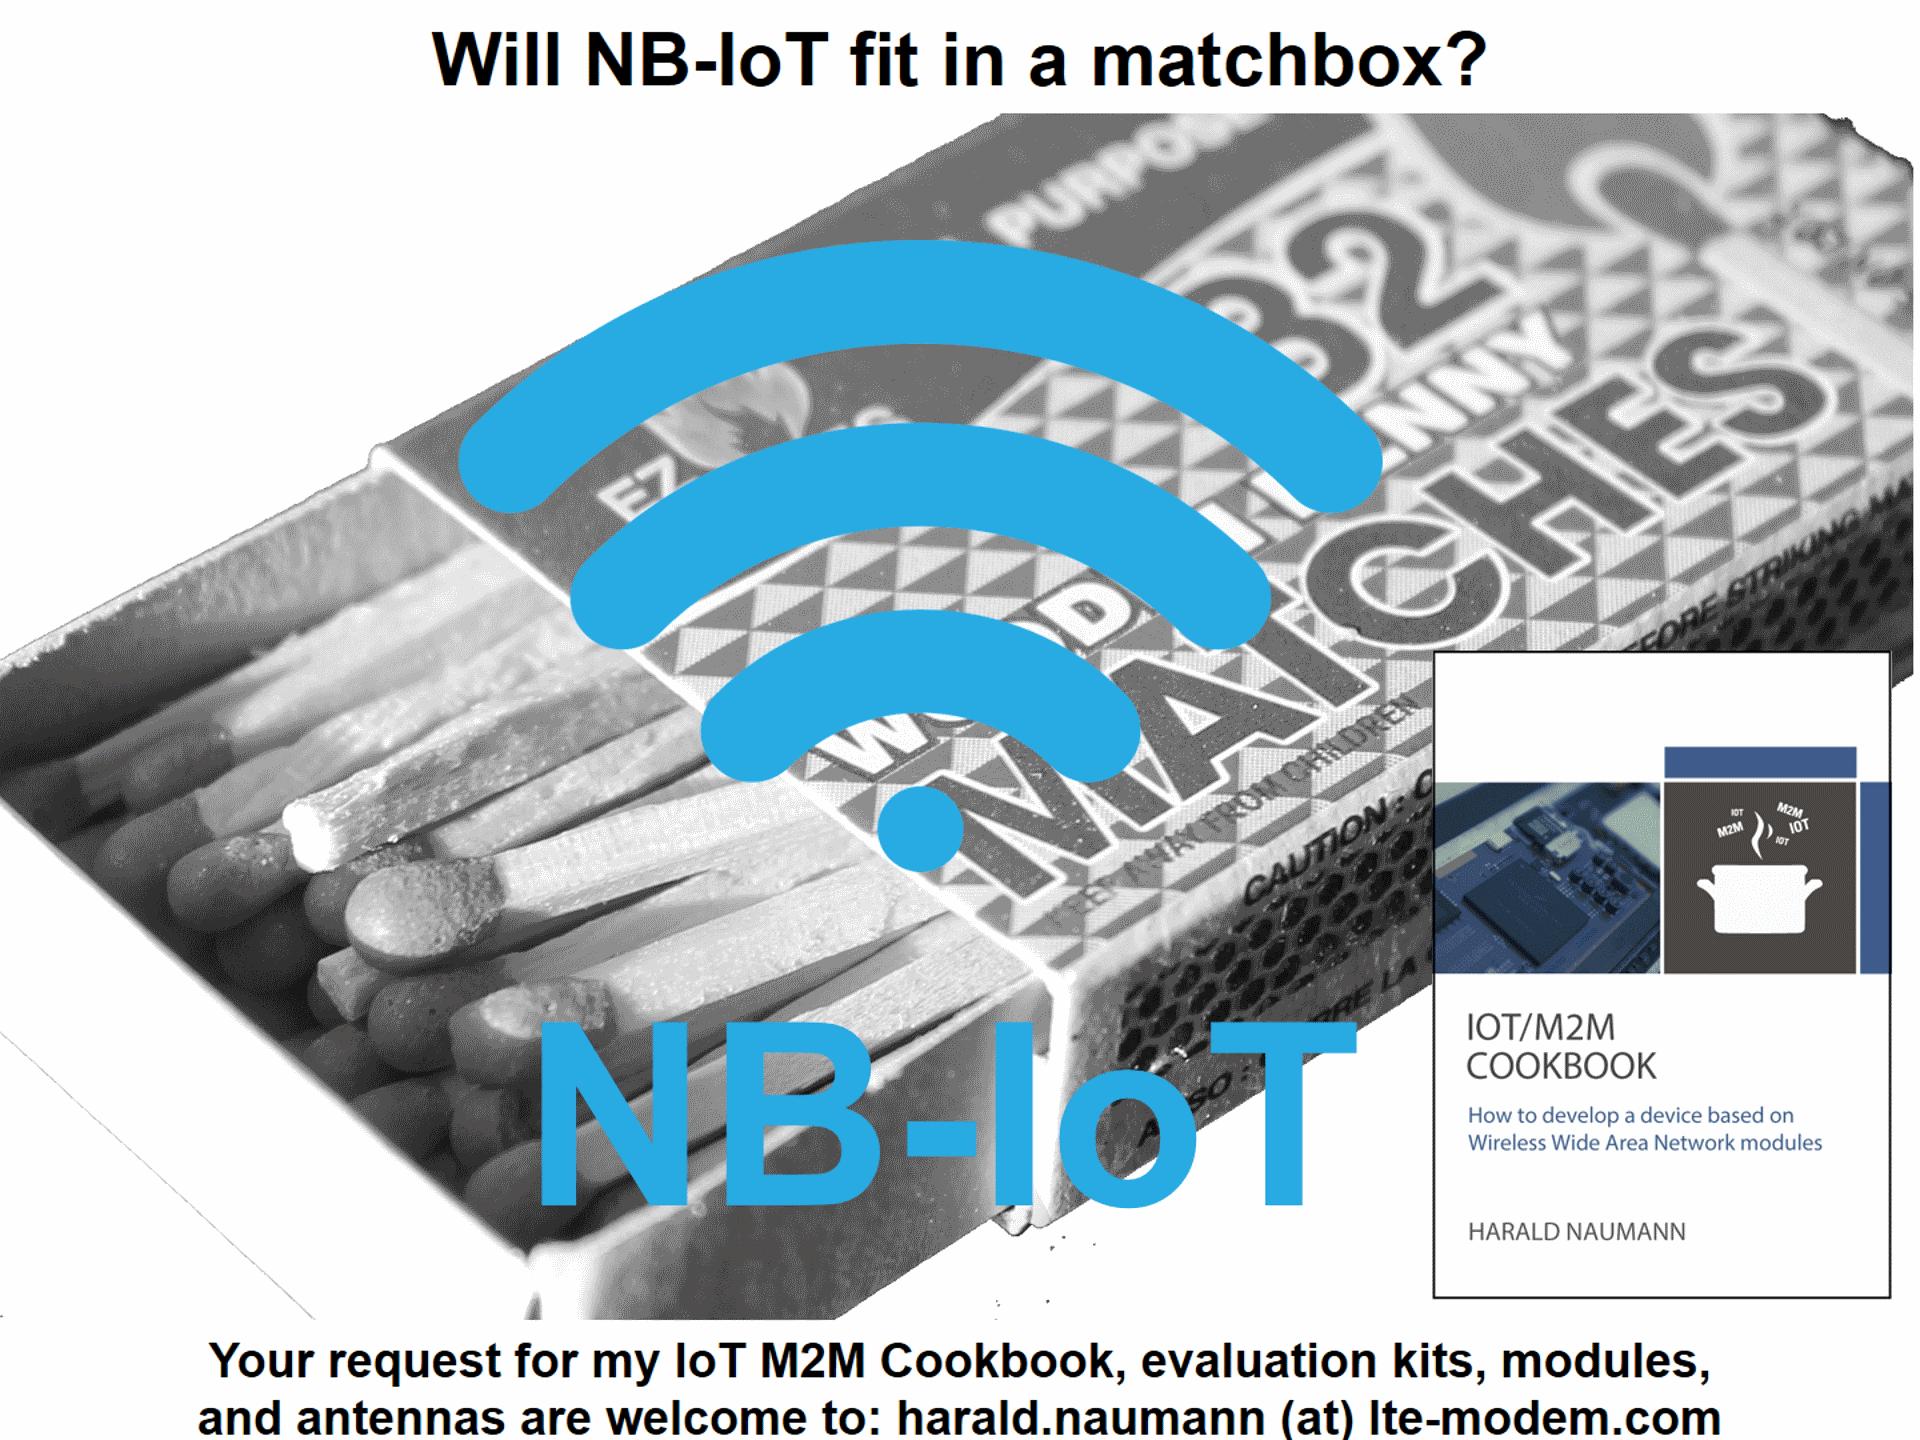 NB-IoT in a matchbox